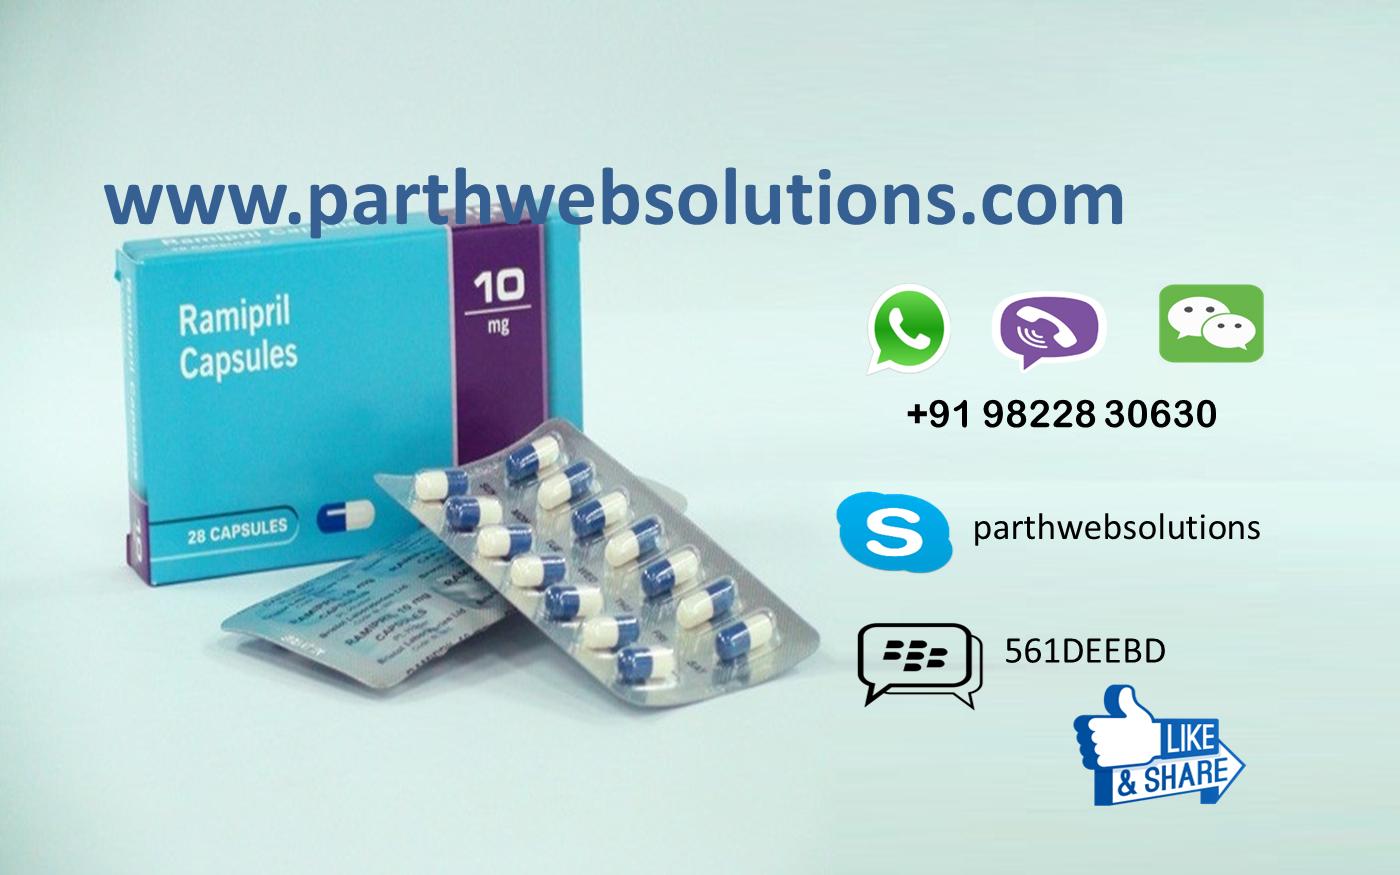 Buy generic levitra with priligy